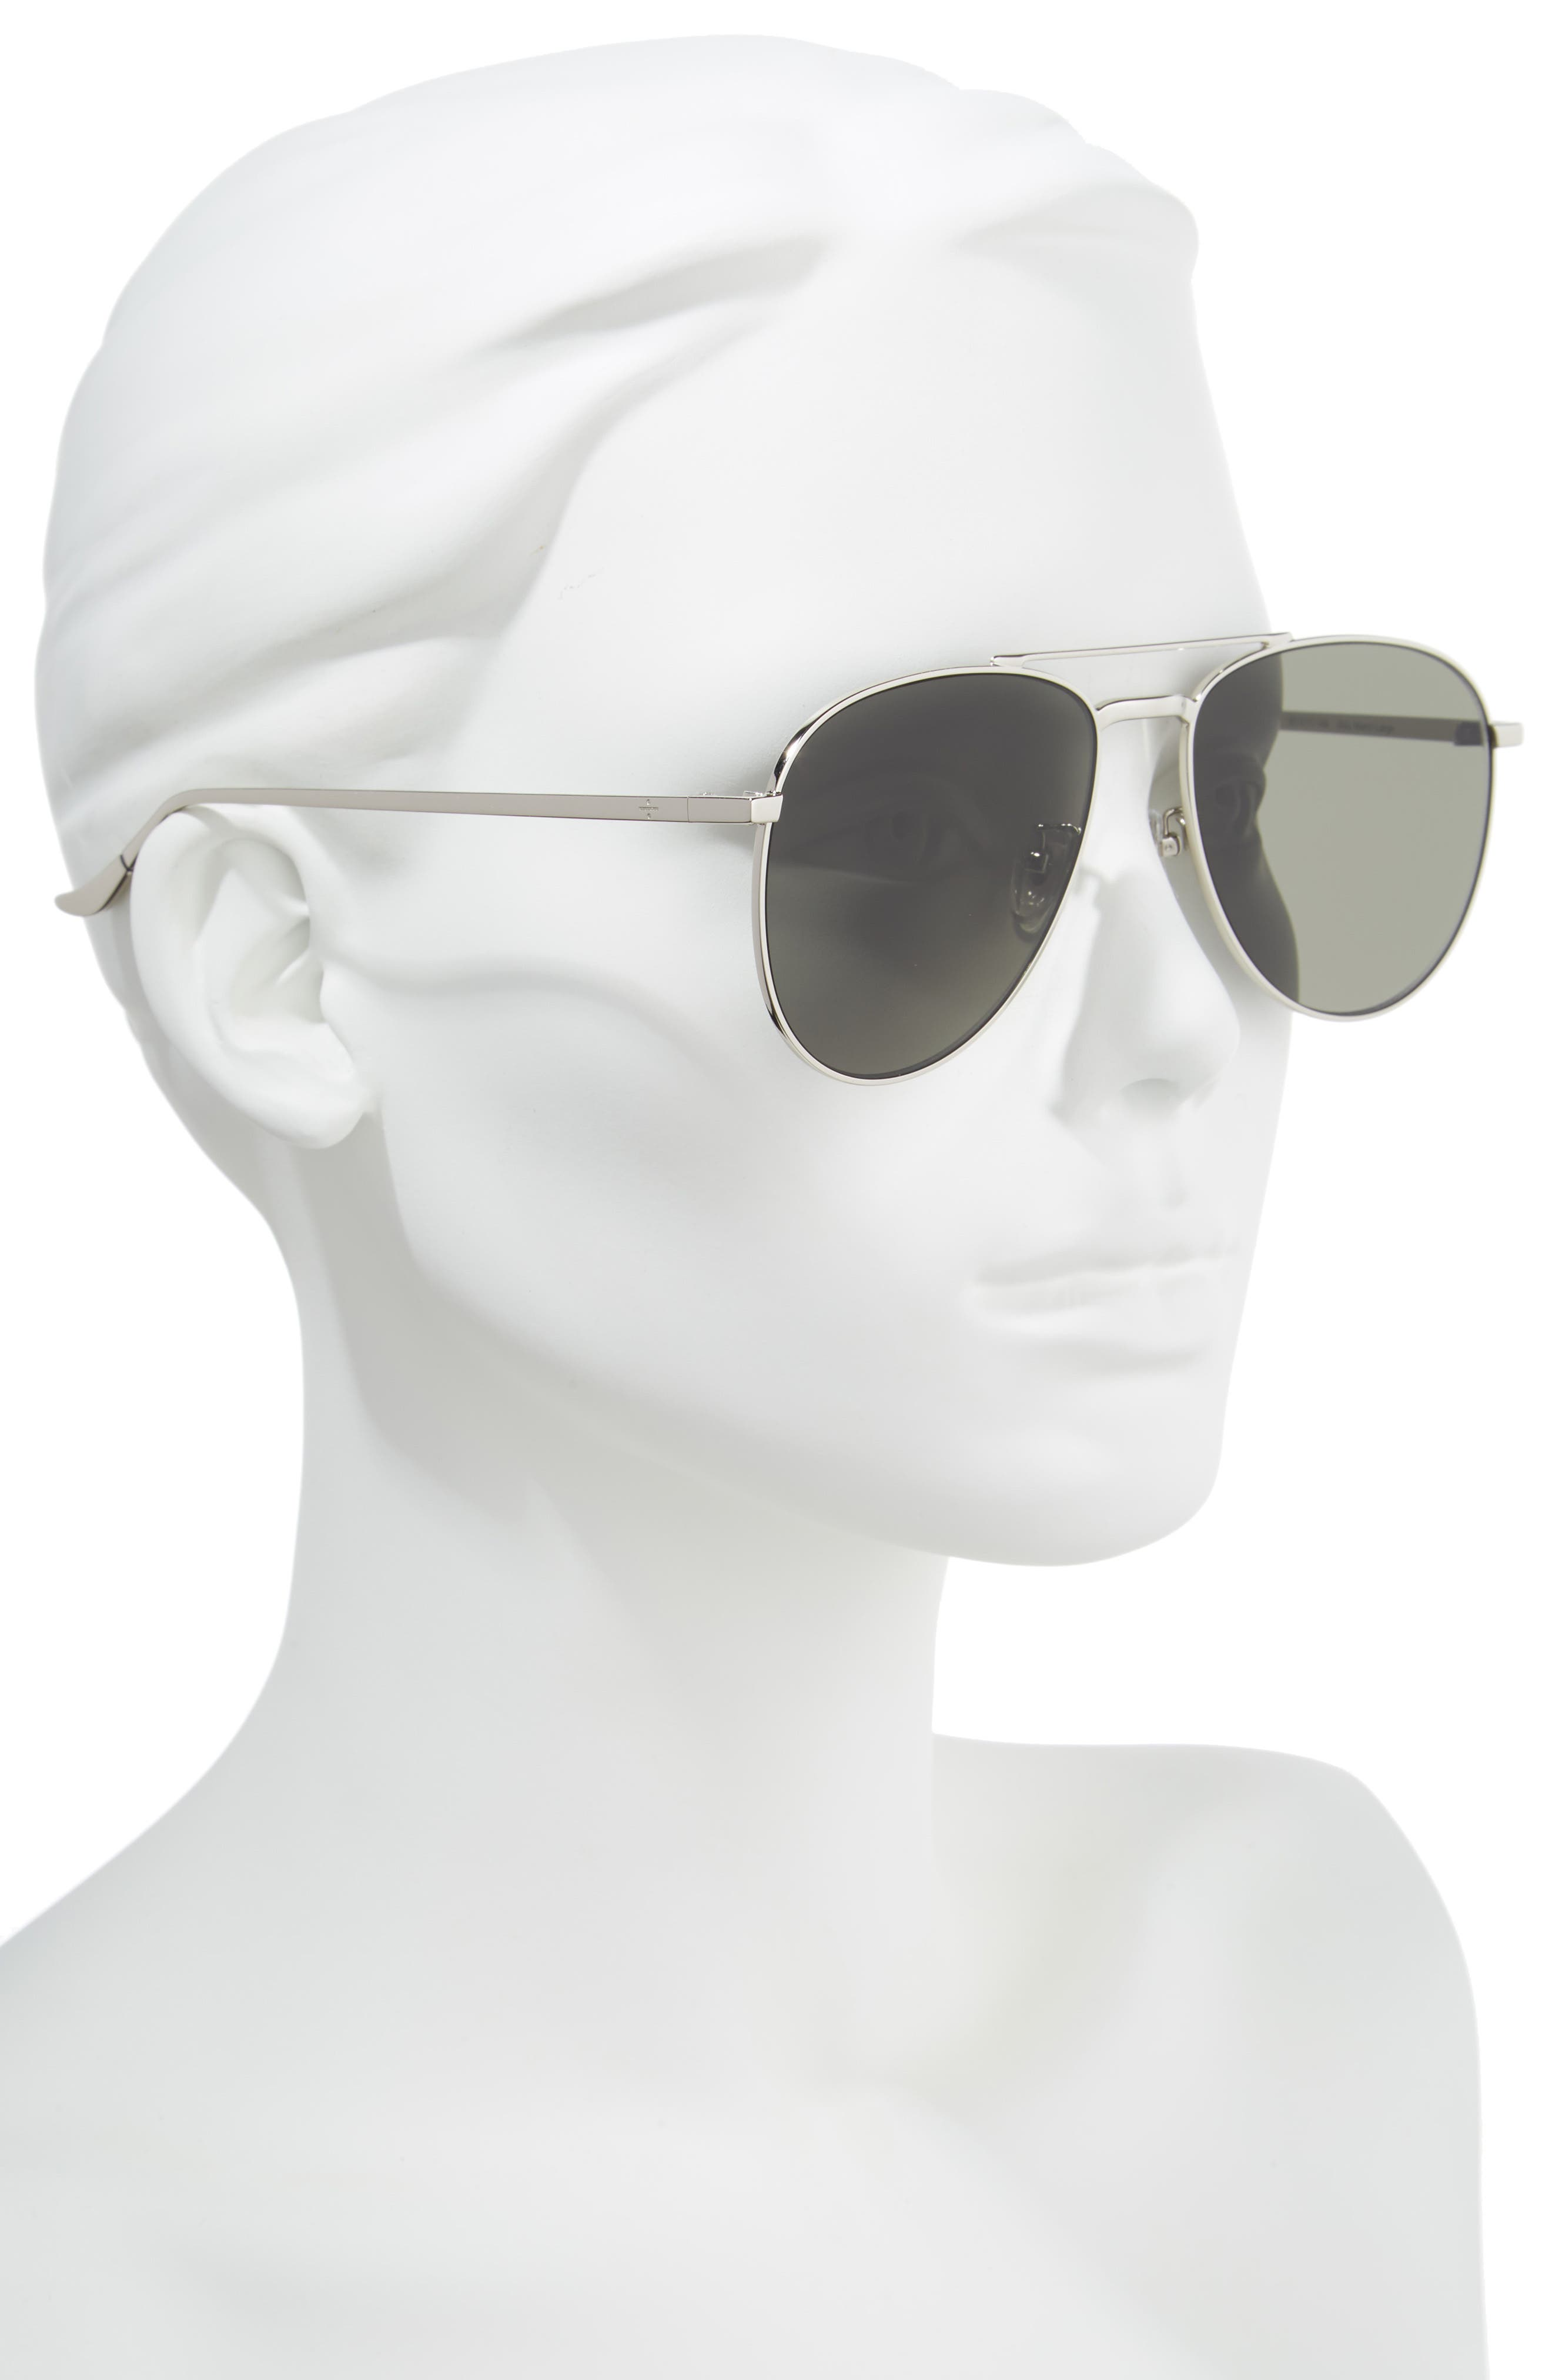 BLANC & ECLARE Miami 61mm Large Polarized Aviator Sunglasses,                             Alternate thumbnail 3, color,                             Silver/ Grey